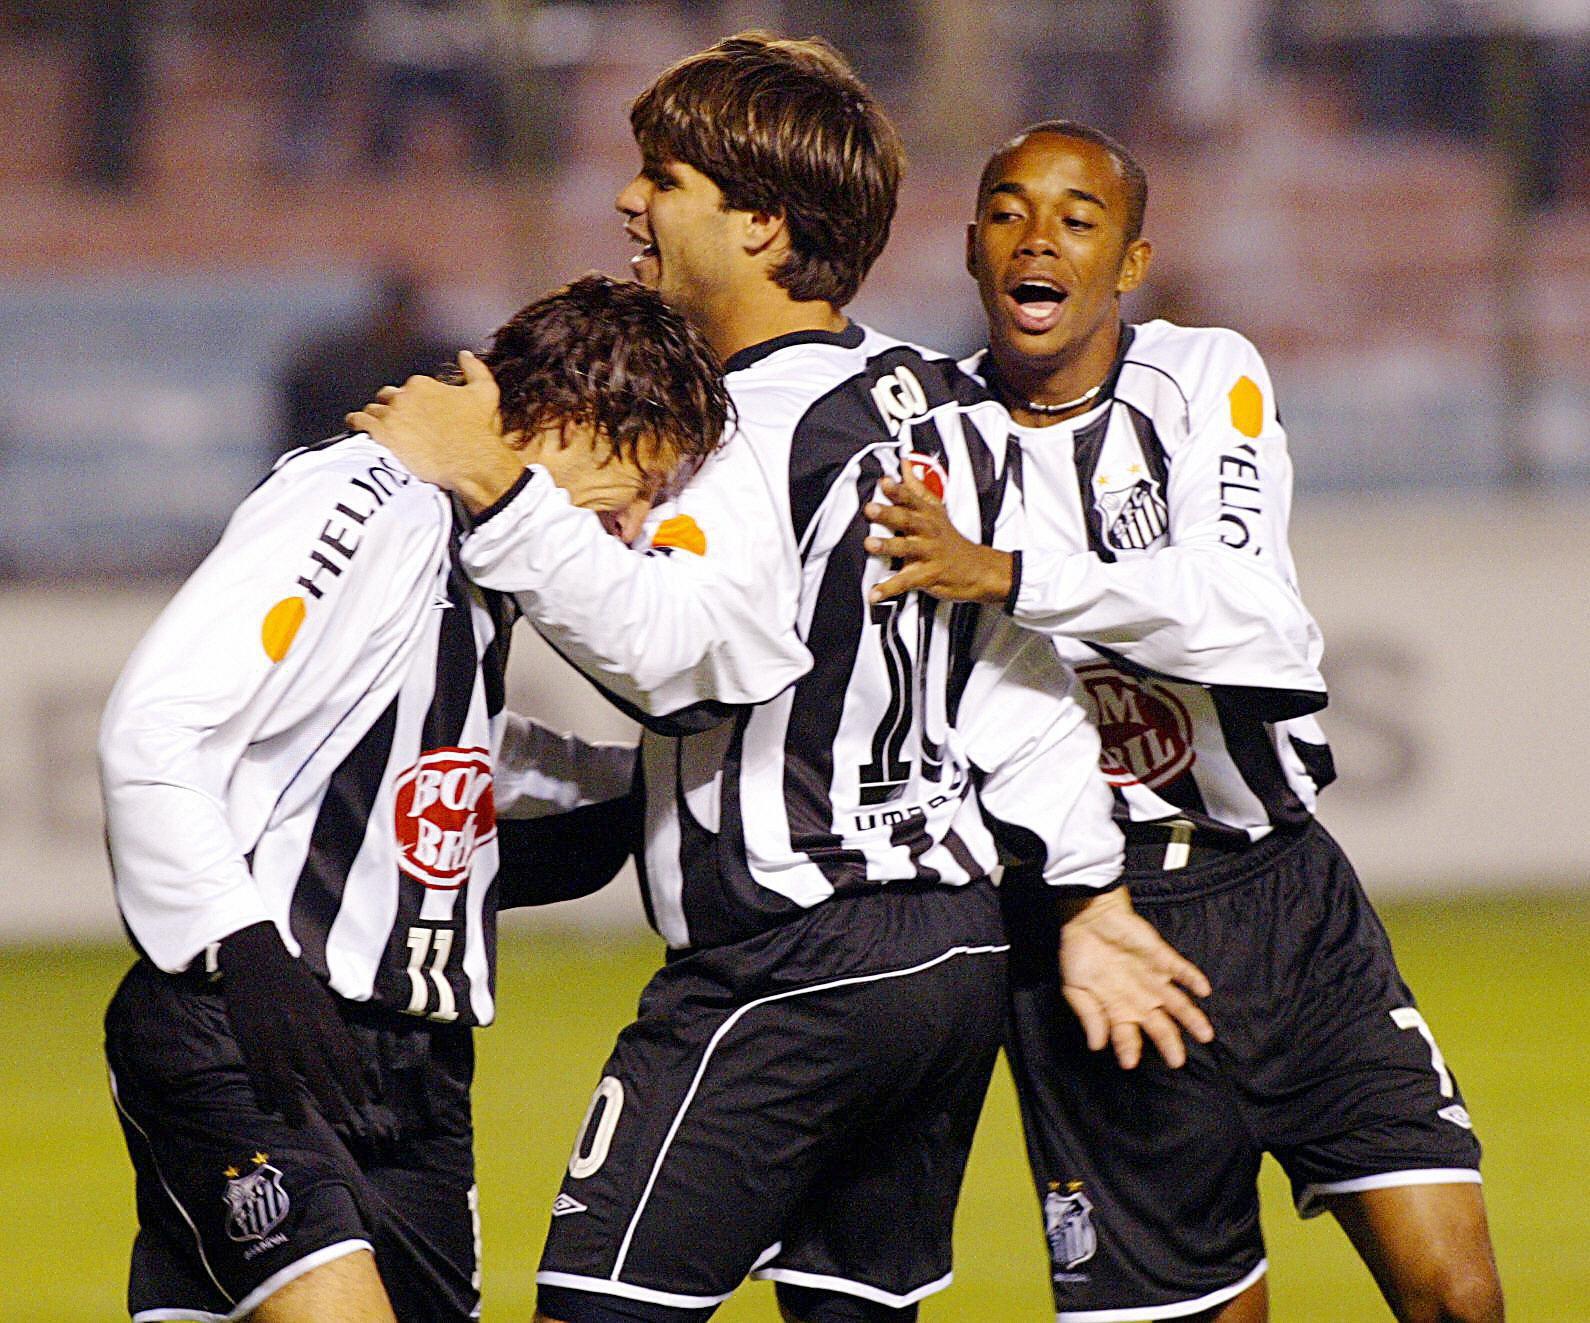 Brazilians-soccer-player-Elano-L-of-1568249481.jpg